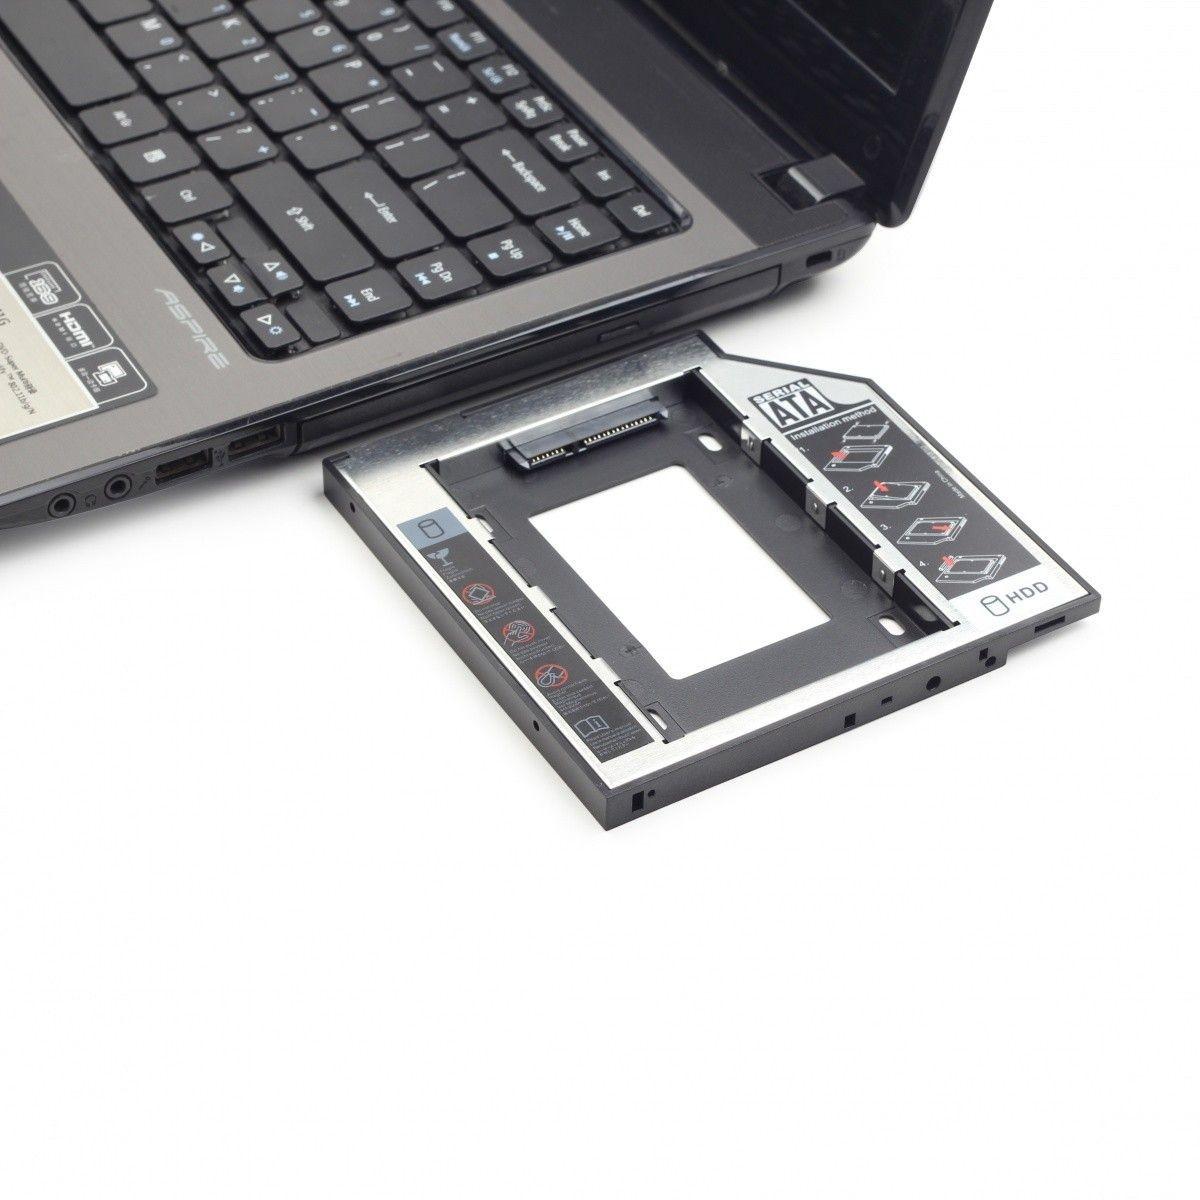 Gembird adapter/ramka HDD 5,25->2,5 slim (HDD/SSD w miejsce CD/DVD w laptopie)